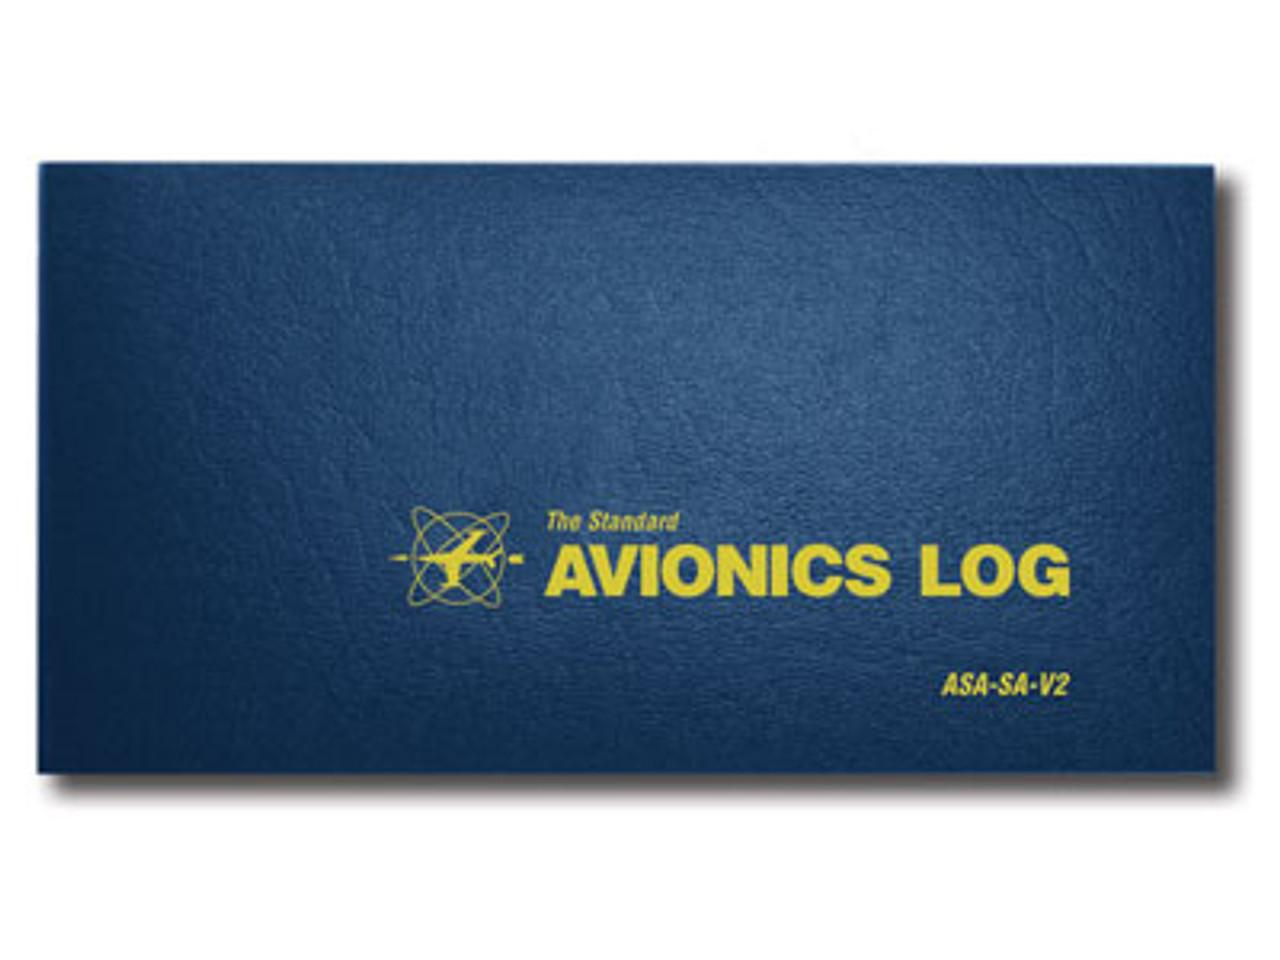 Complete Aircraft Maintenance Logbook Combo - Airframe, Engine, Avionics, Prop